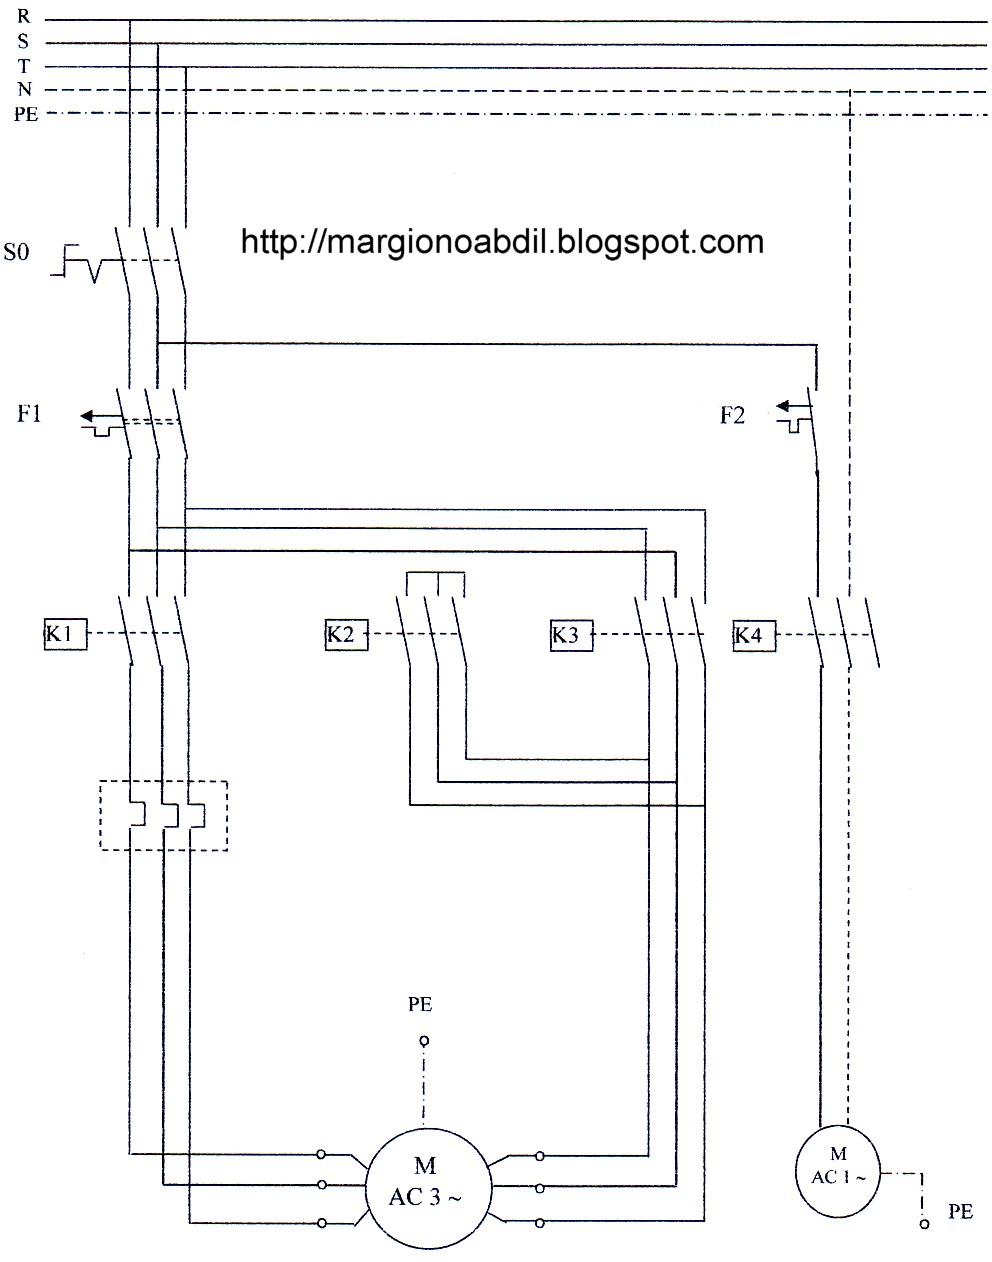 alberta fire alarm system guide 2006 pdf